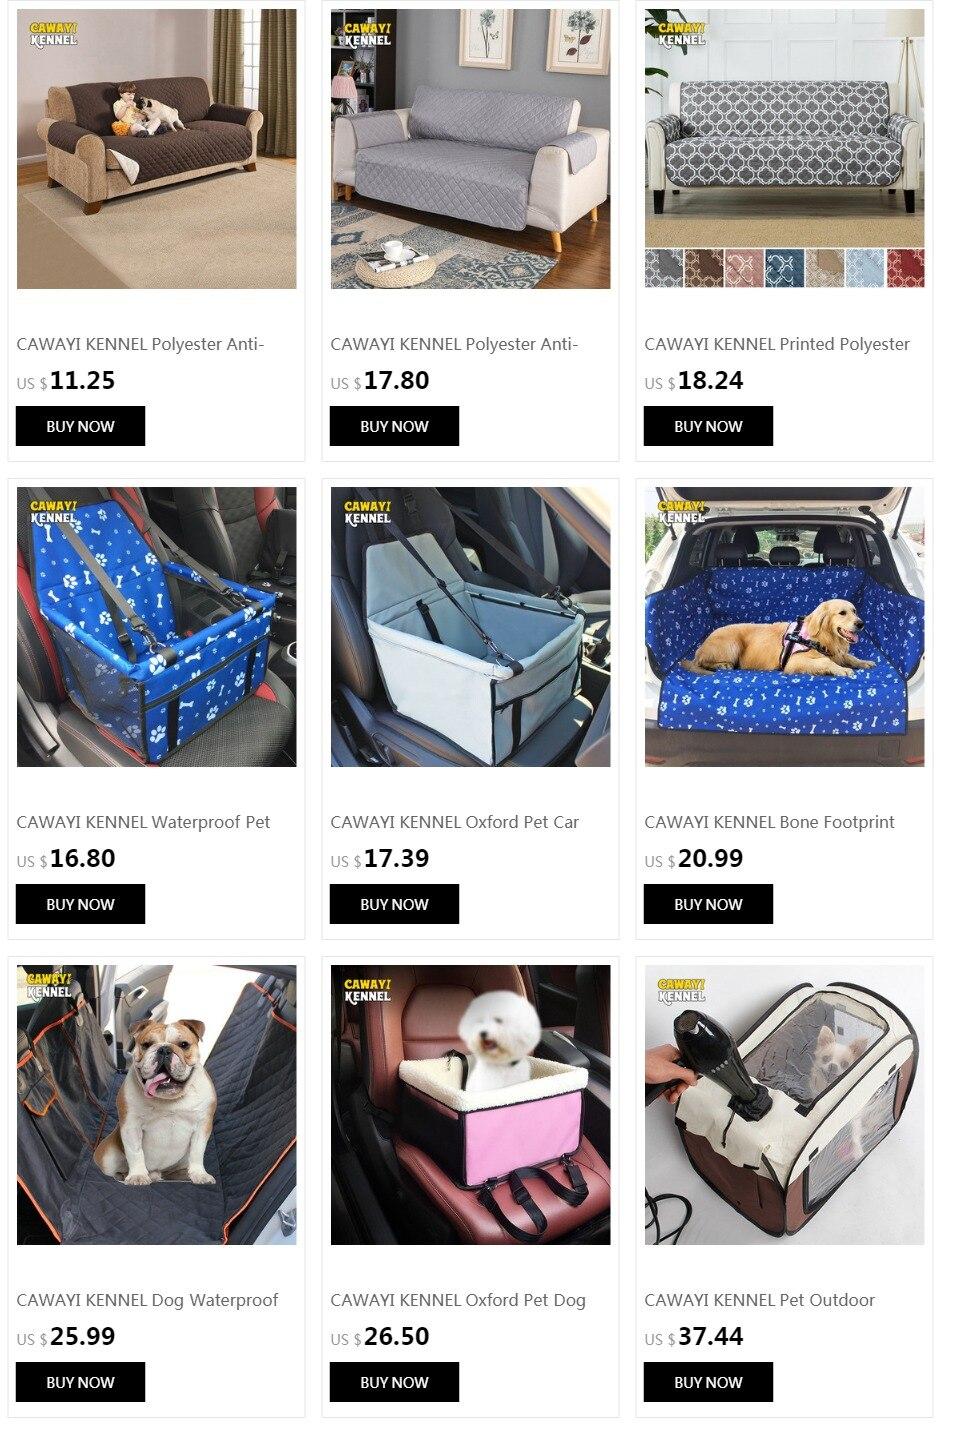 CAWAYI KENNEL PVC Waterproof Small Pet Dog Cat Car Seat Cover Mat Blanket Rear Back Dog Car Seat Protection Hammock D0041 1